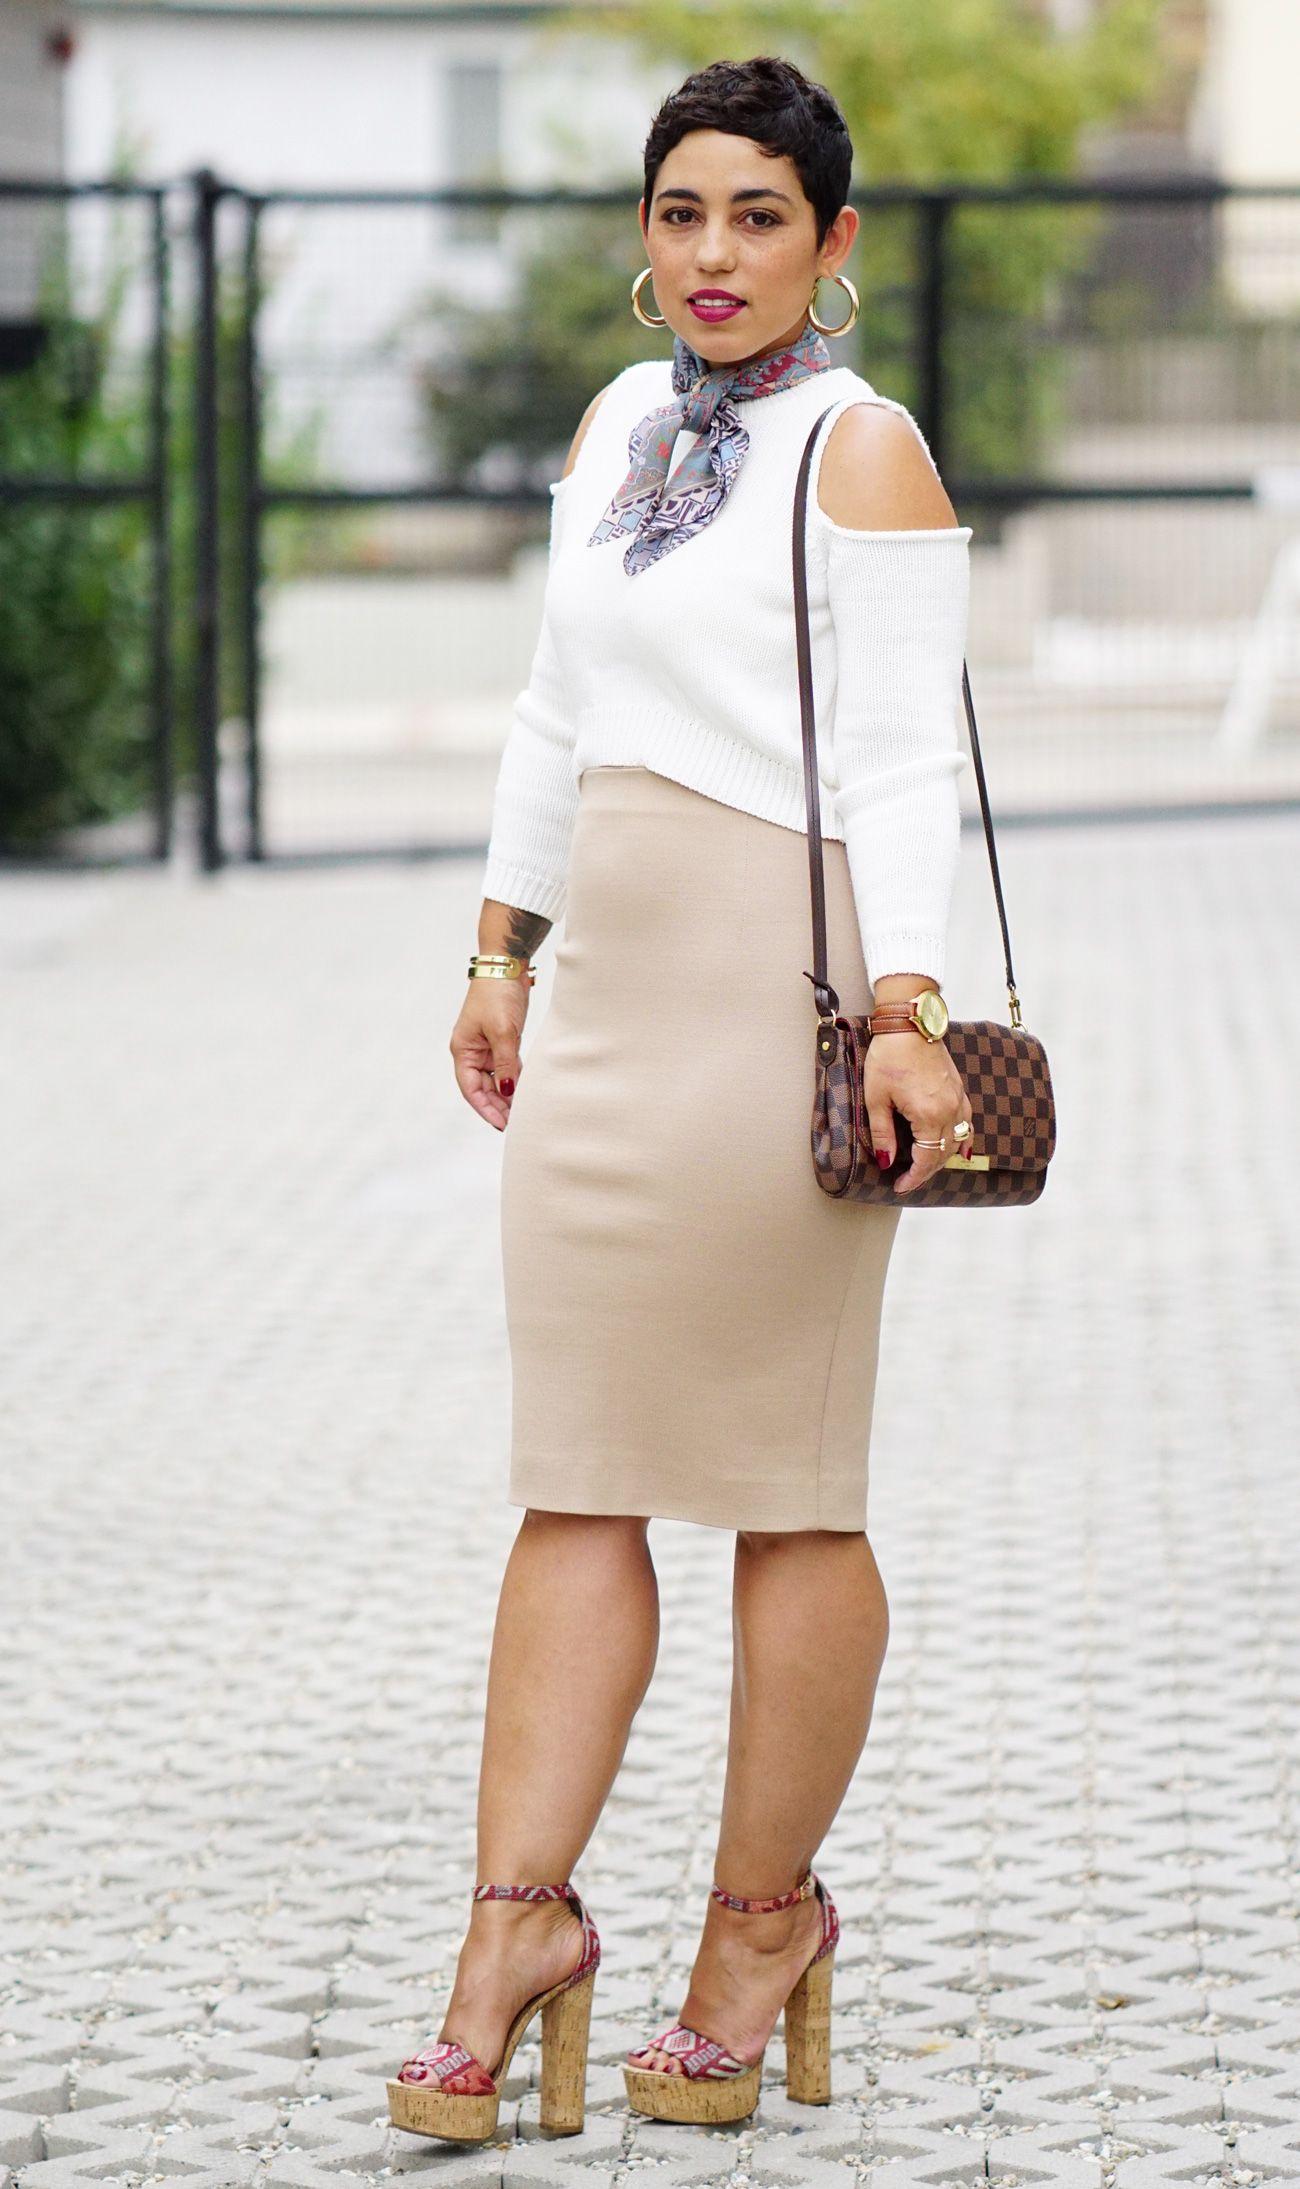 DIY HIGH WAIST KNIT SKIRT   Fashion, Style, How to make skirt